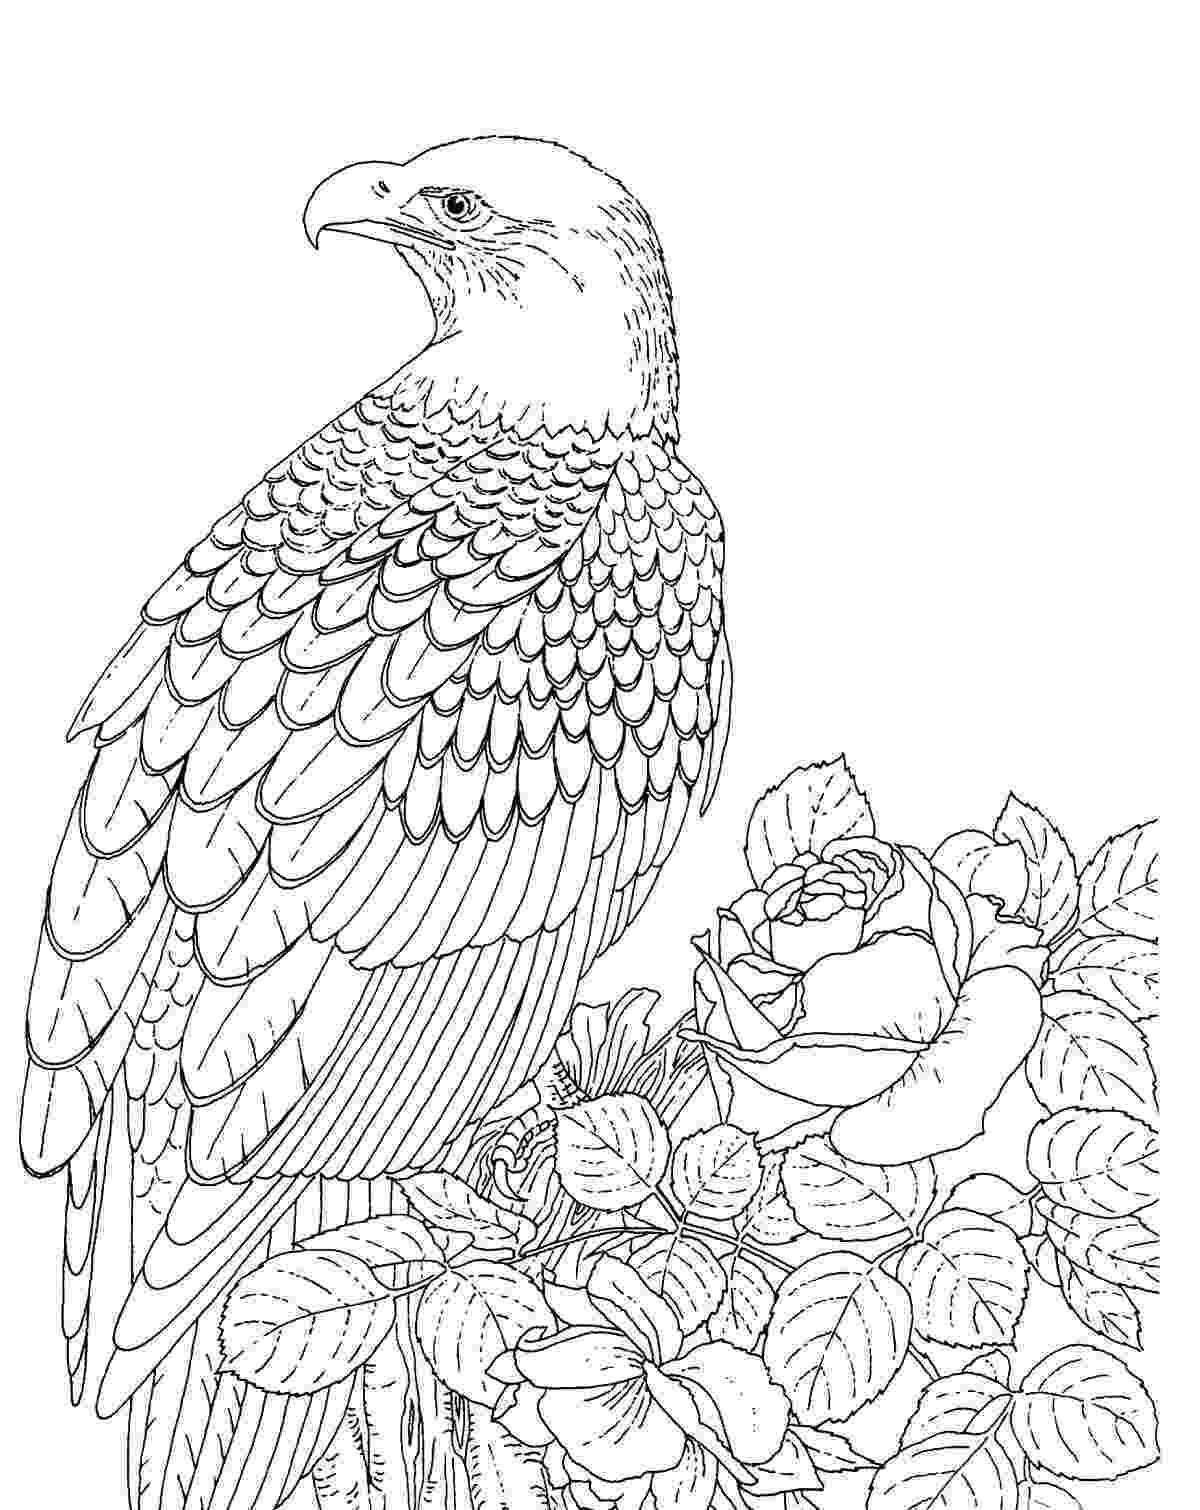 coloring book eagle printable eagle coloring pages for kids cool2bkids book eagle coloring